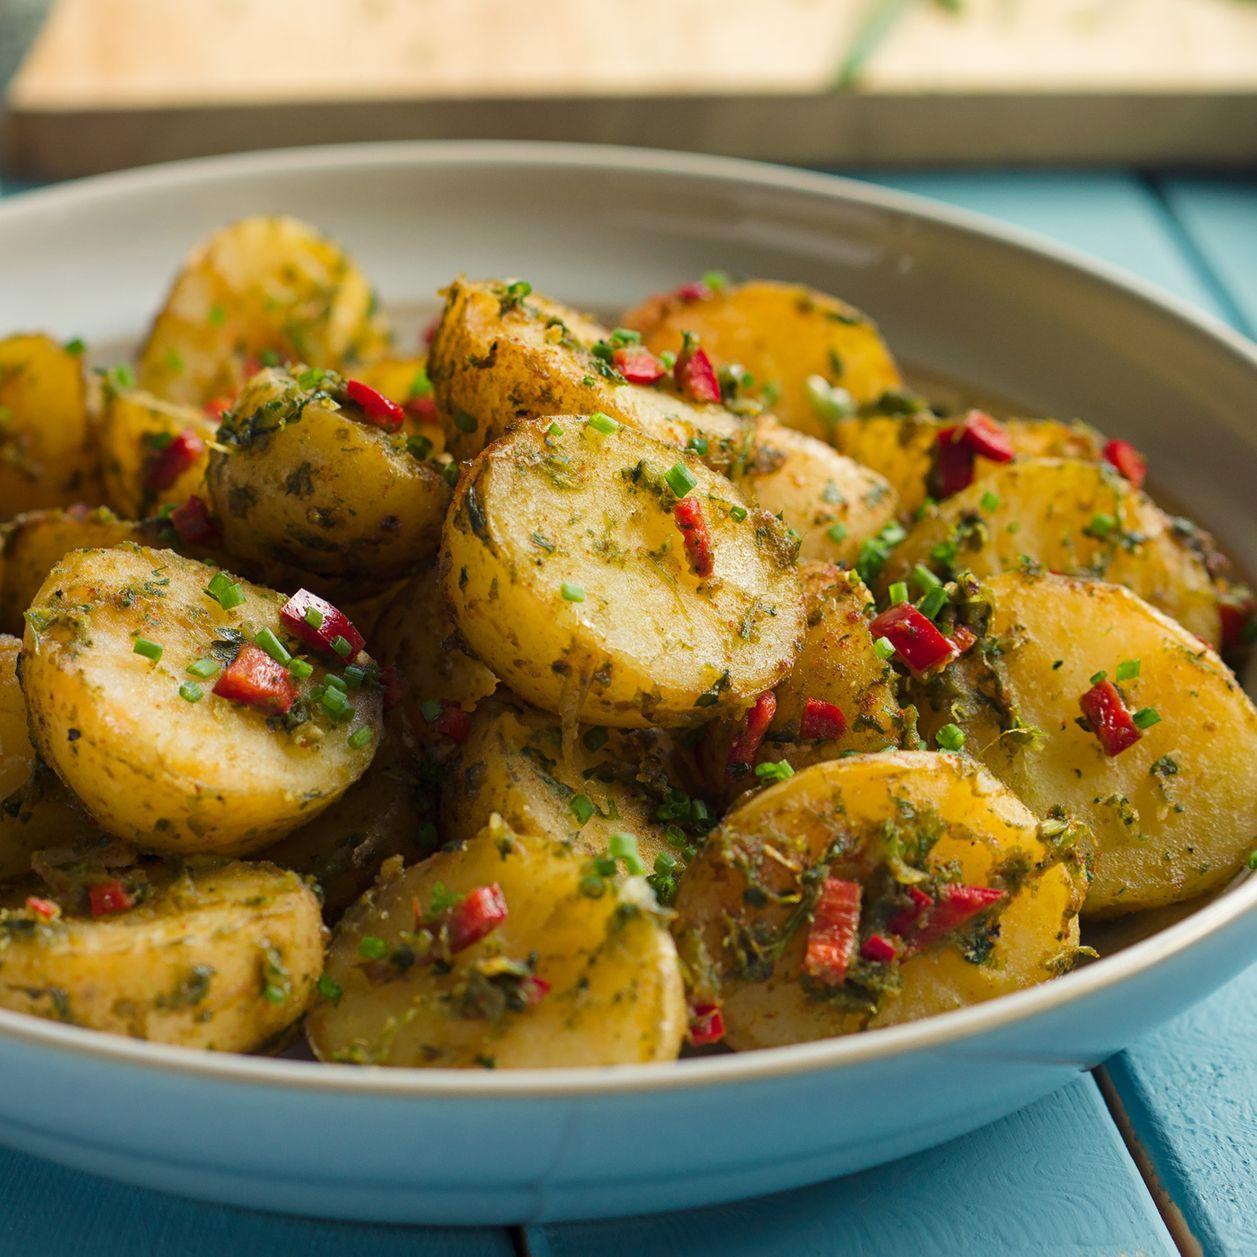 ef1e8bf668fa3eb6d73288d6243d2649 - Rezepte Kartoffelsalat